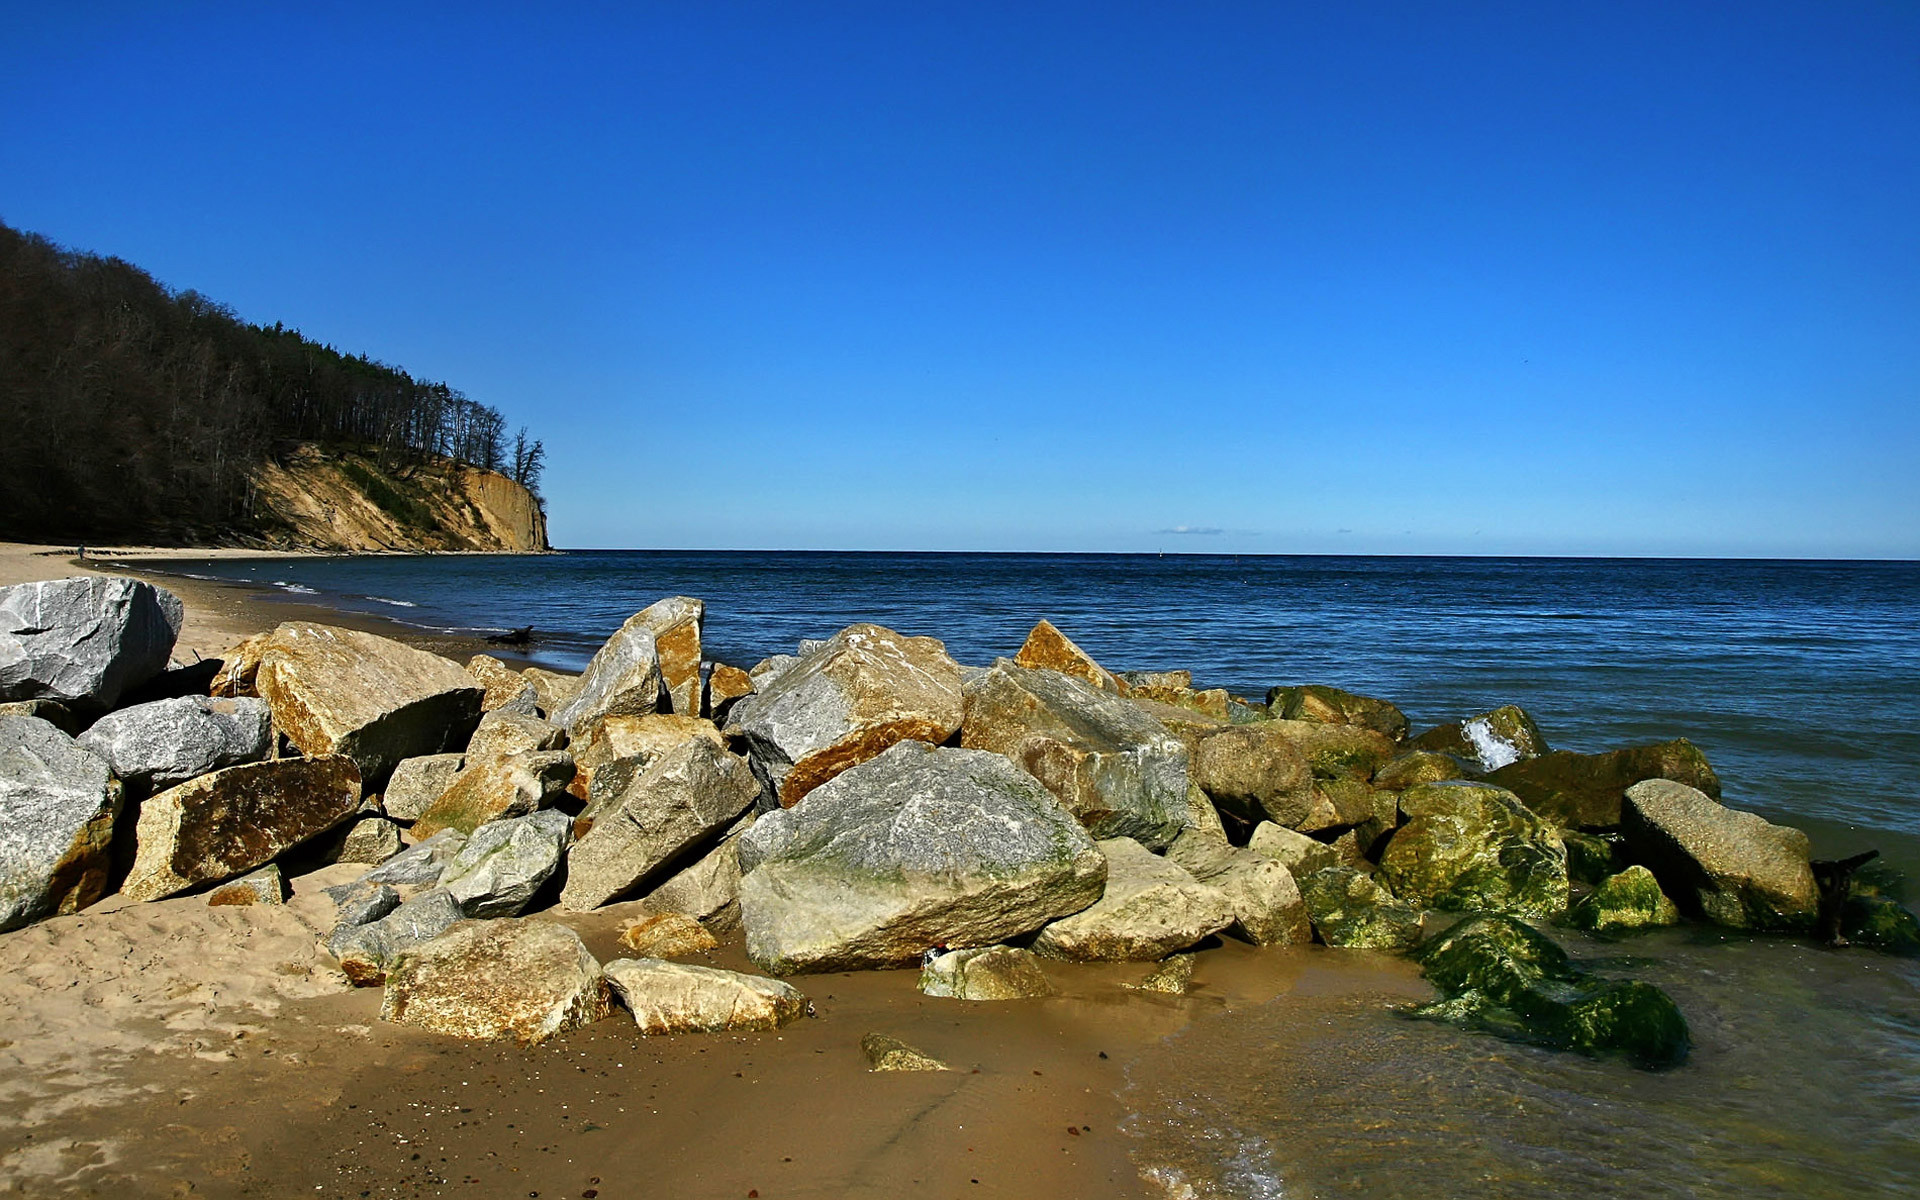 … Sunny handy rock beach wallpaper